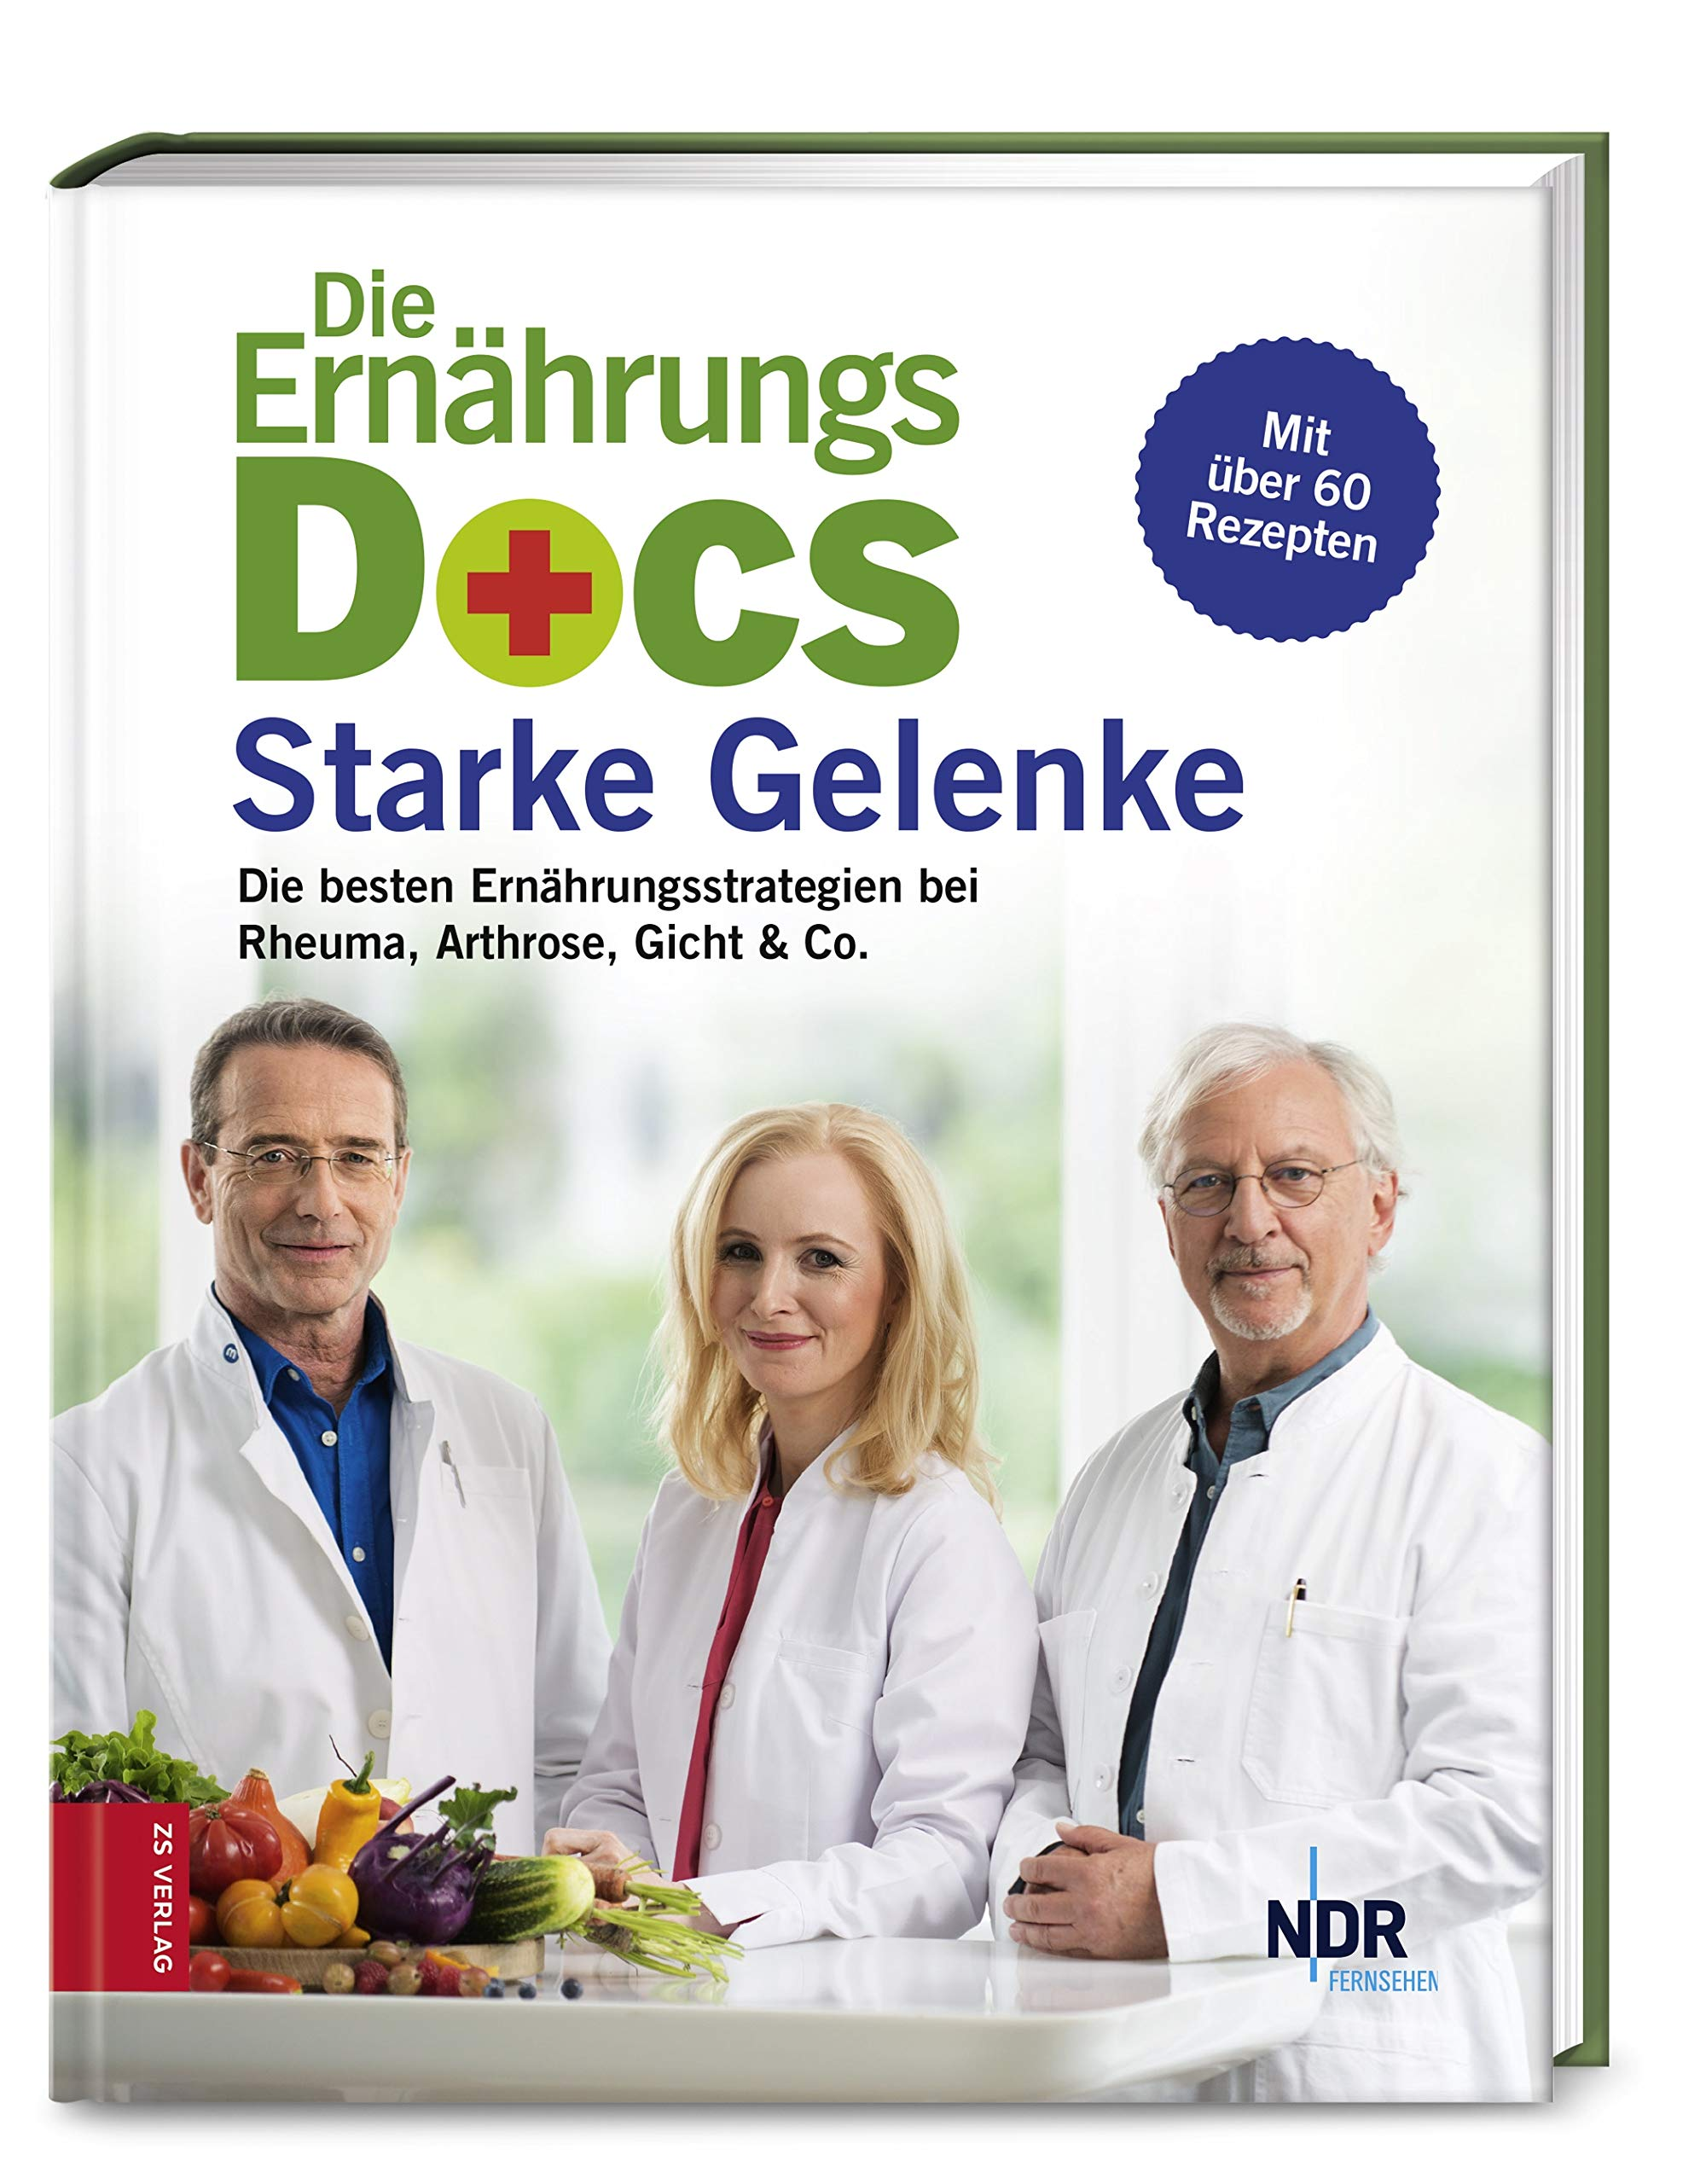 die ernährungs docs arthrose